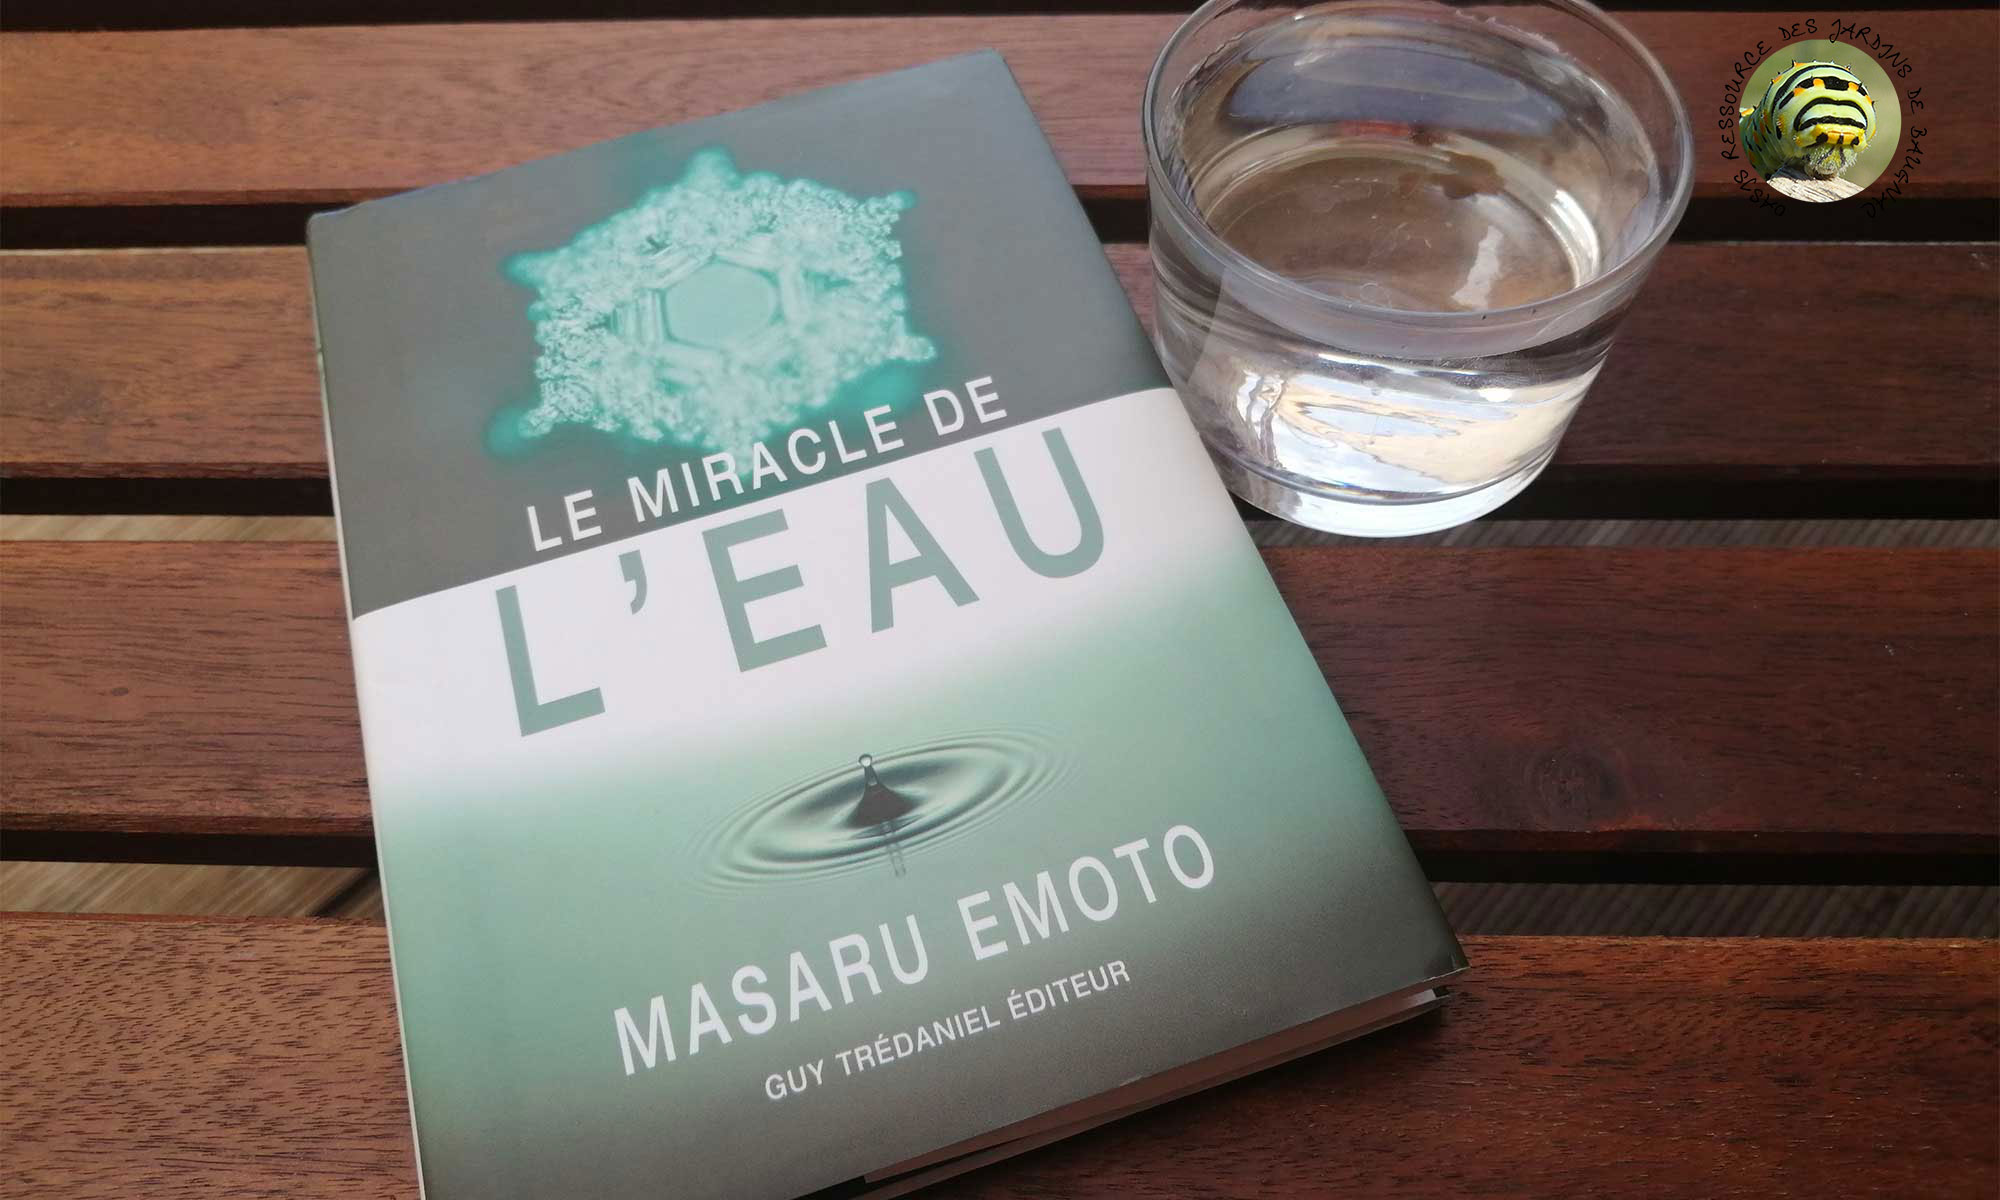 Le miracle de l'eau de Masaru Emoto.